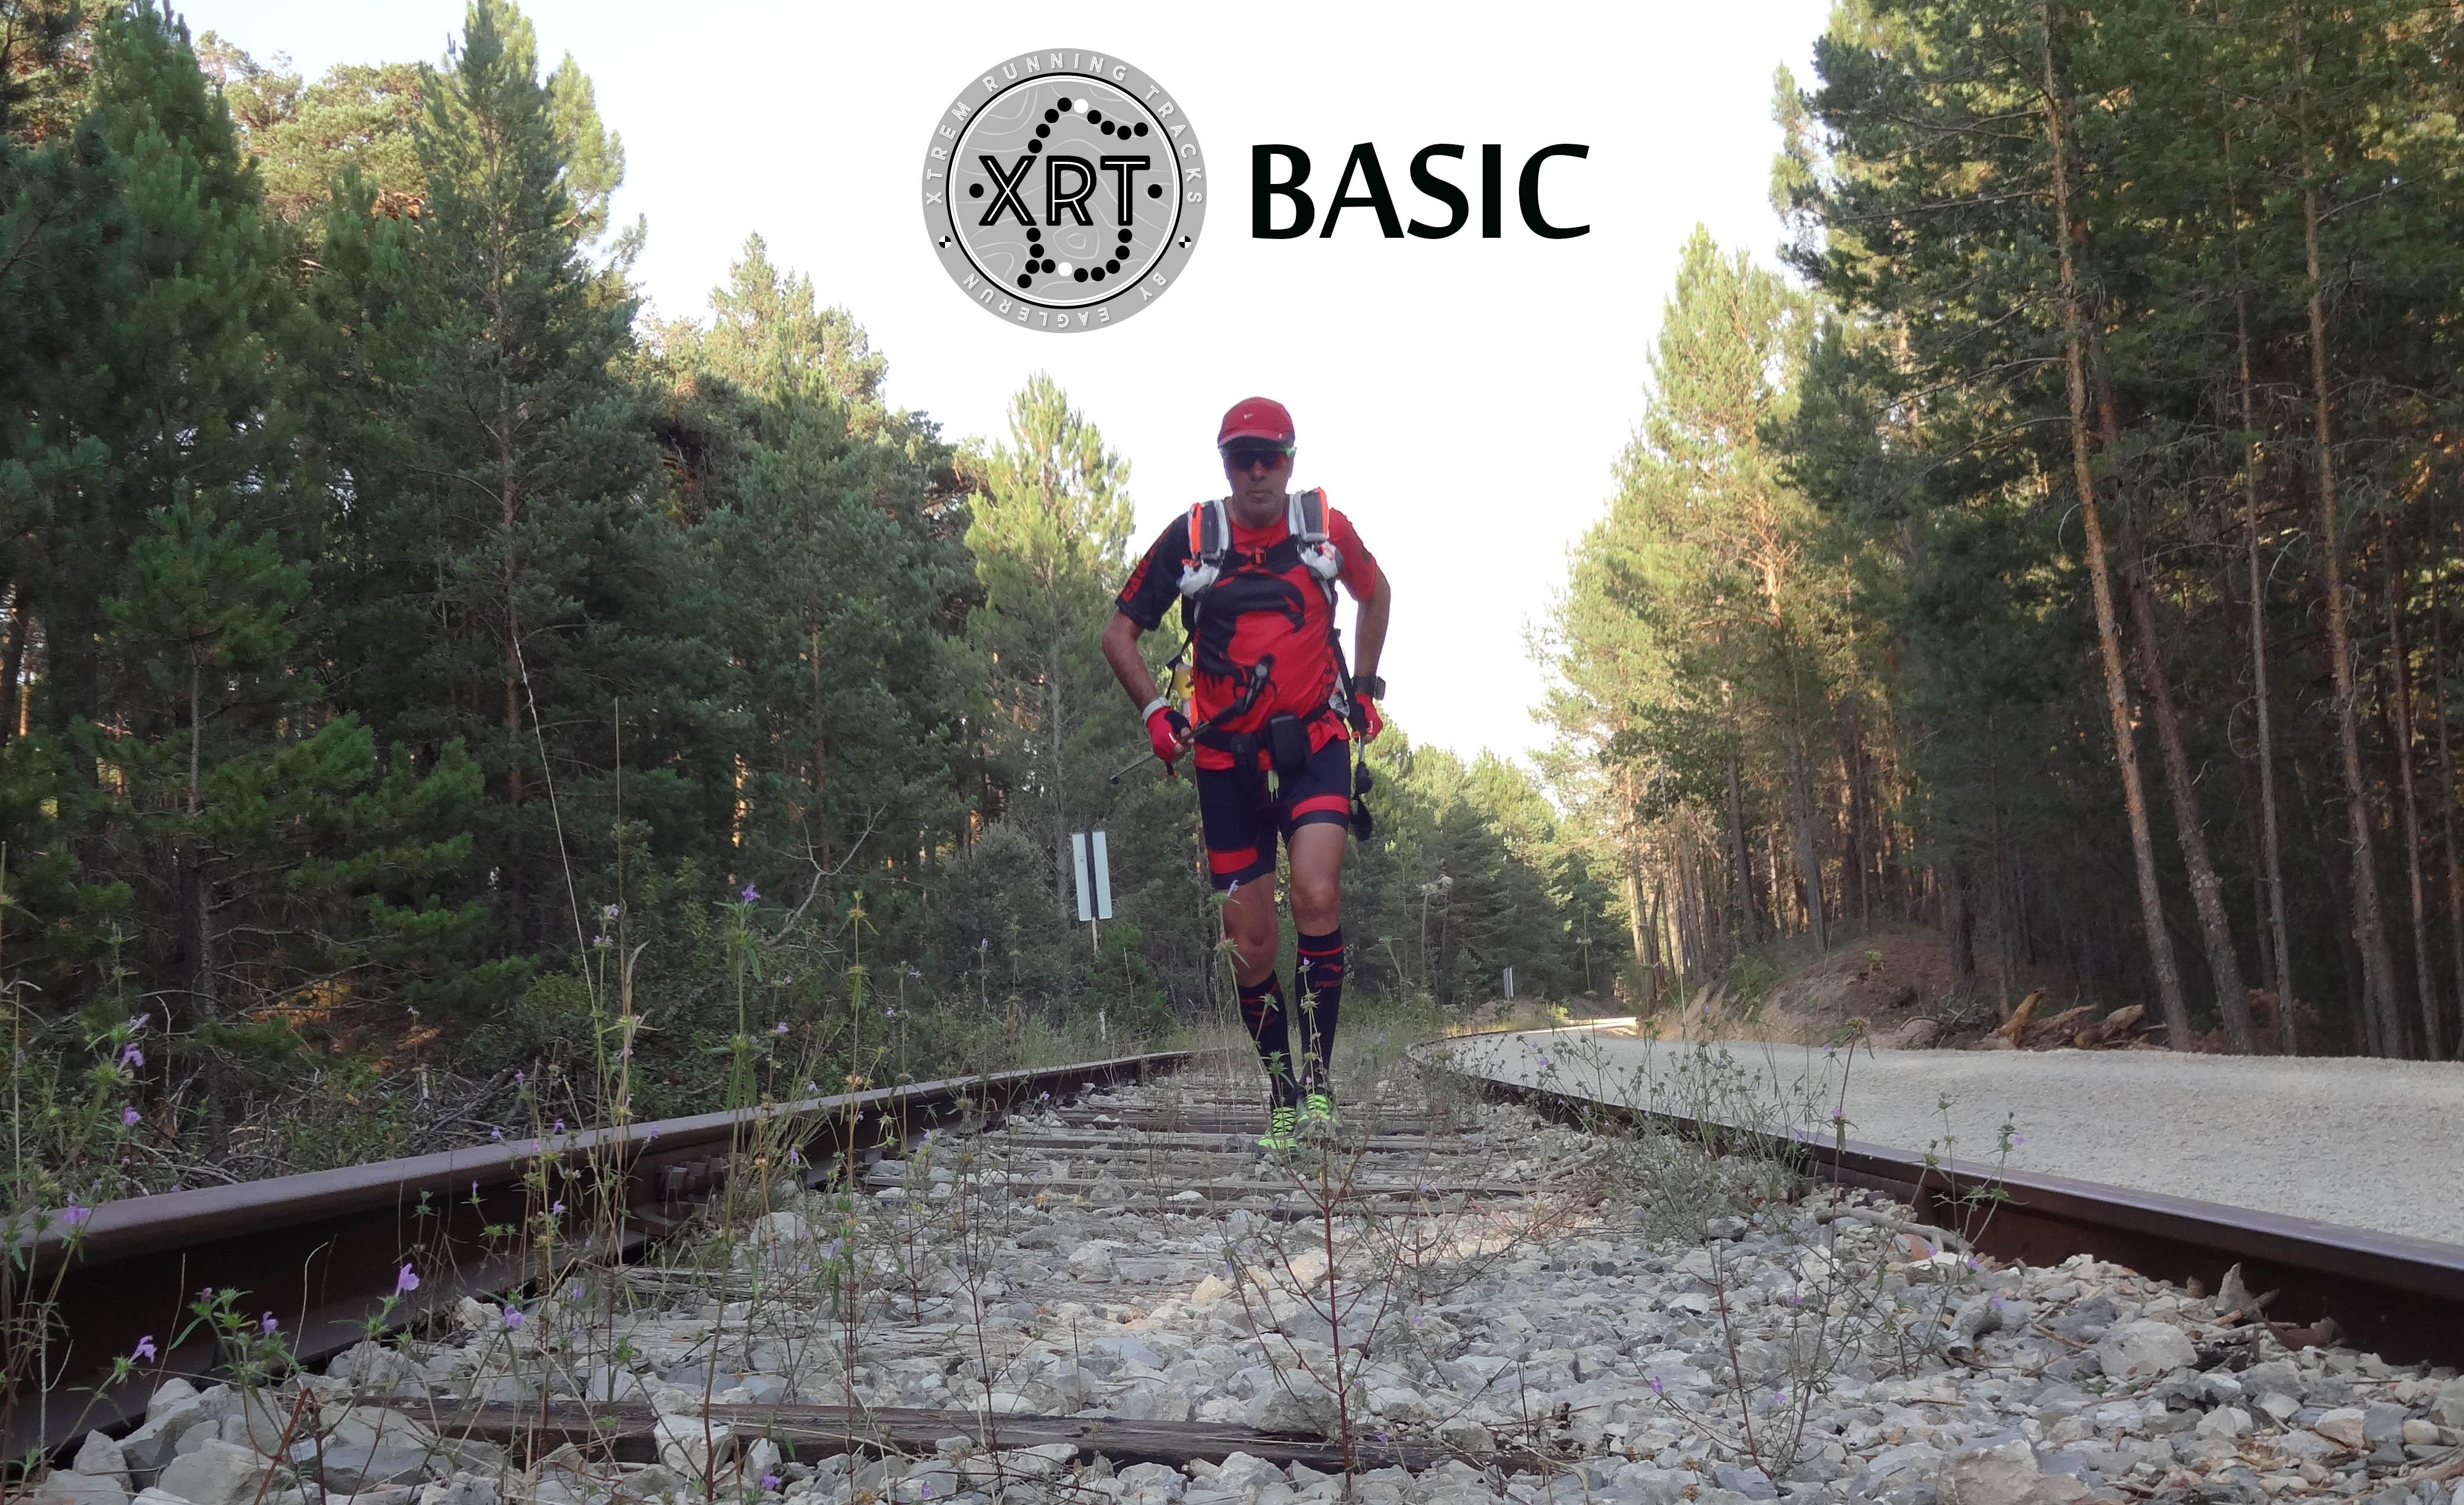 XRT Wix 01 Basic Ok 2